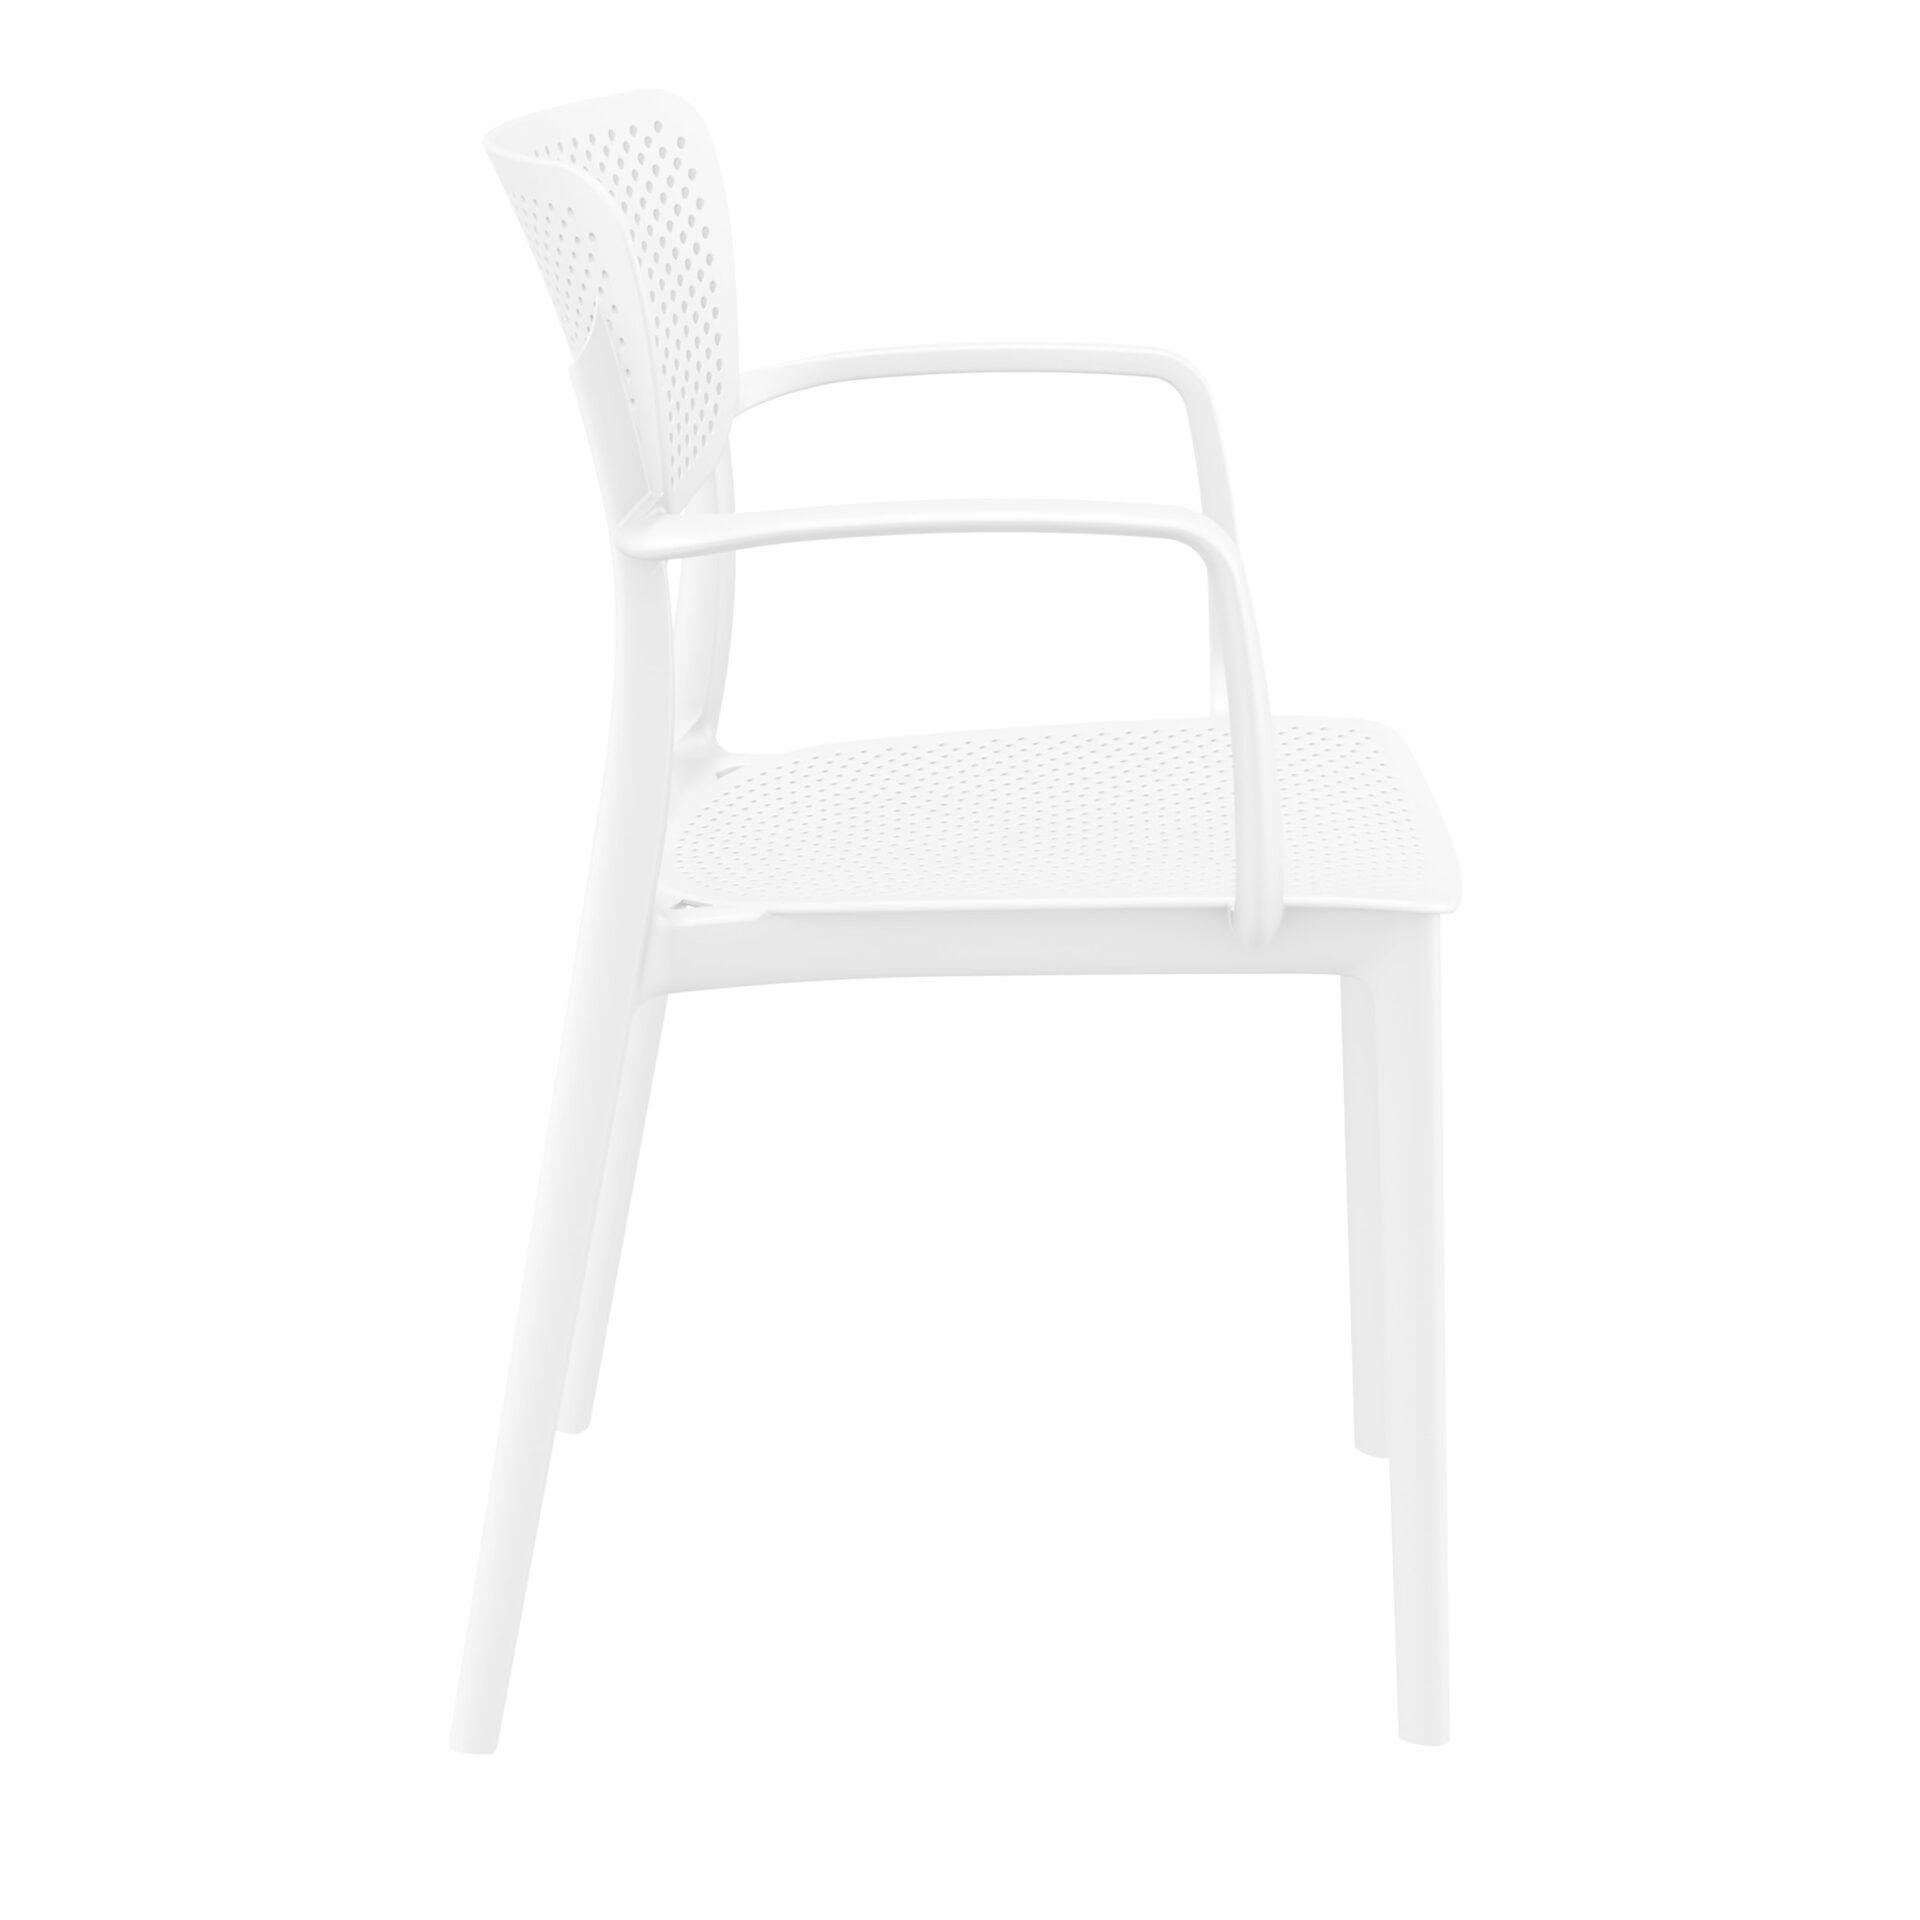 polypropylene hospitality seating loft armchair white side